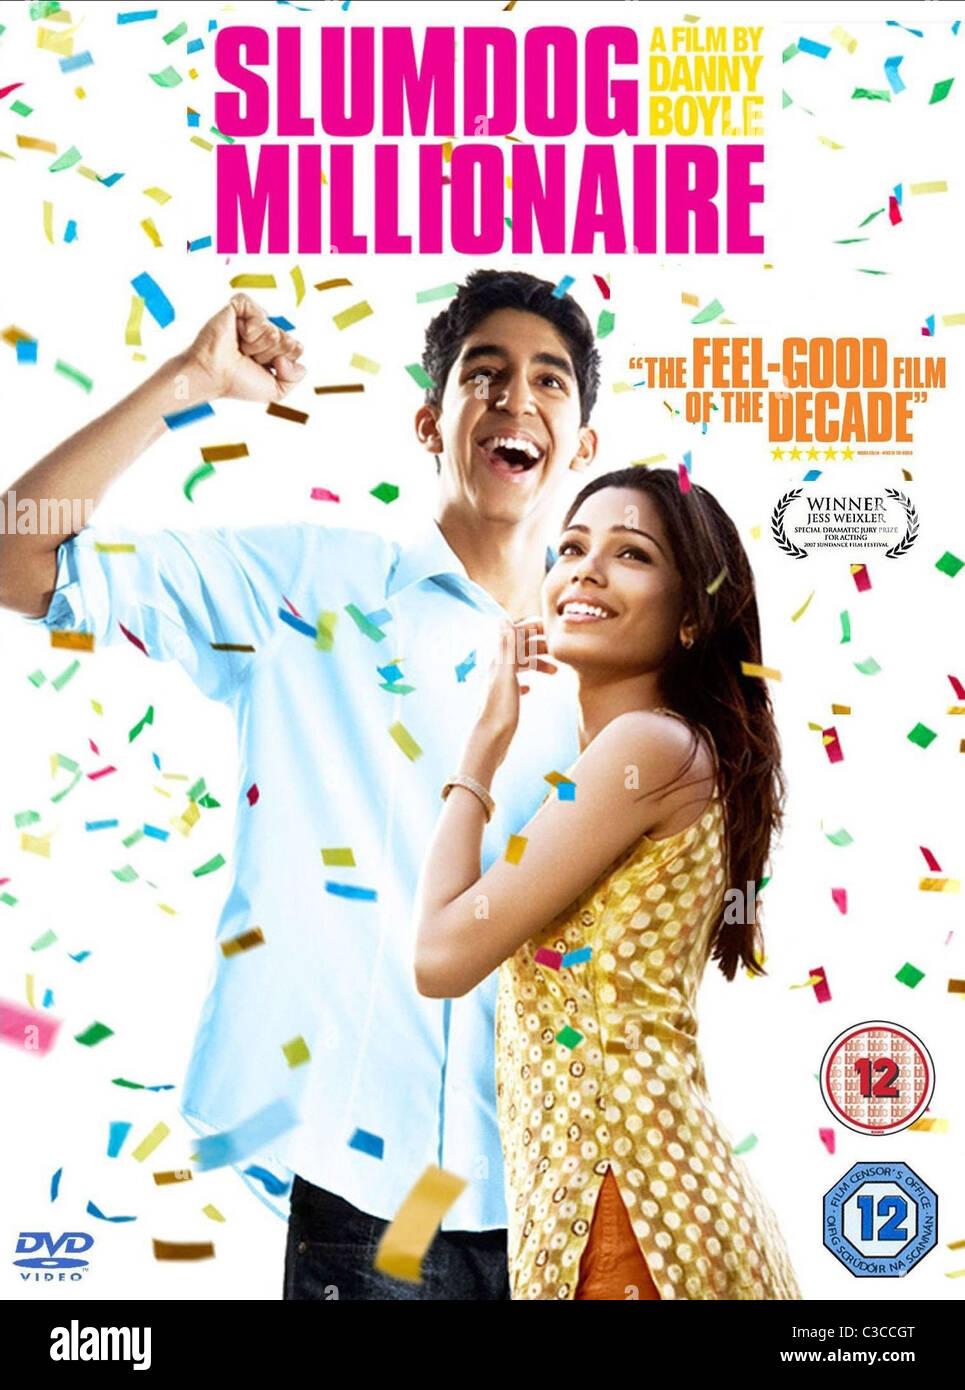 Dev Patel Freida Pinto Poster Slumdog Millionaire 2008 Stock Photo Alamy